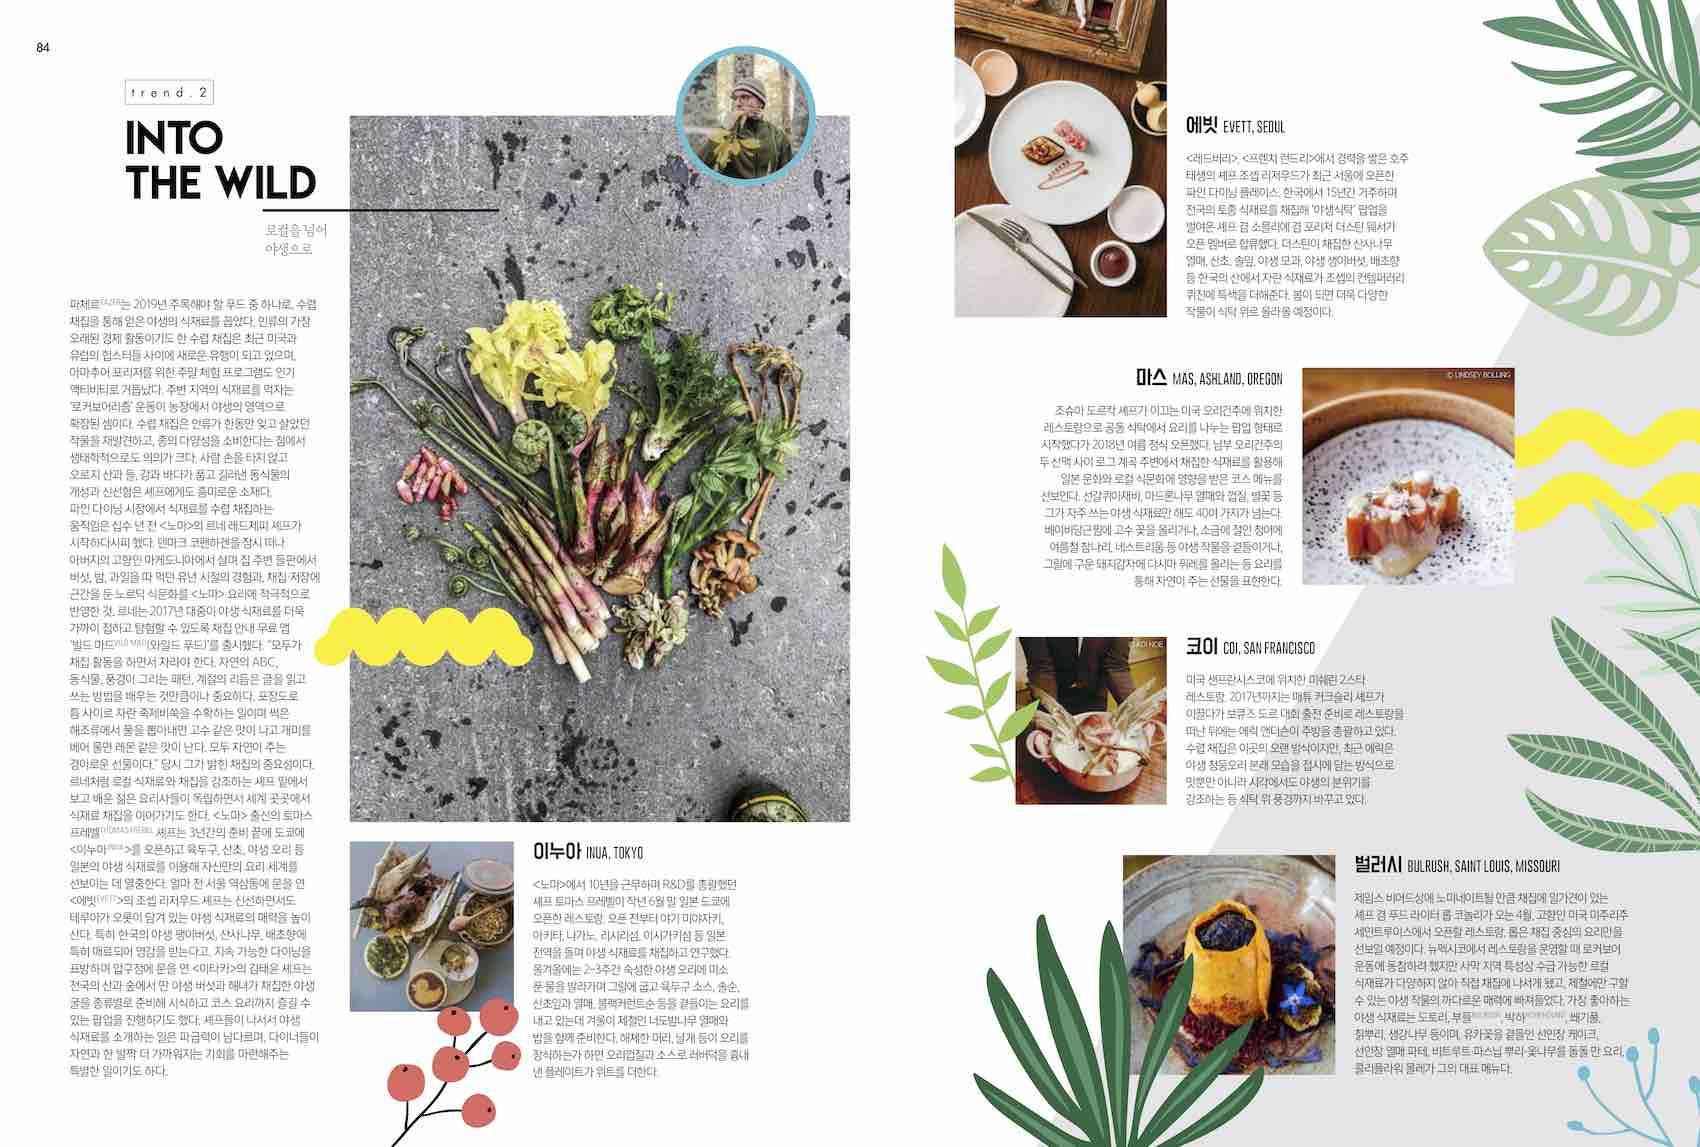 Bar & Dining Magazine in Korea features chef Josh Dorcak's MÄS restaurant featuring Cascadian Cuisine in idyllic Ashland, Oregon.